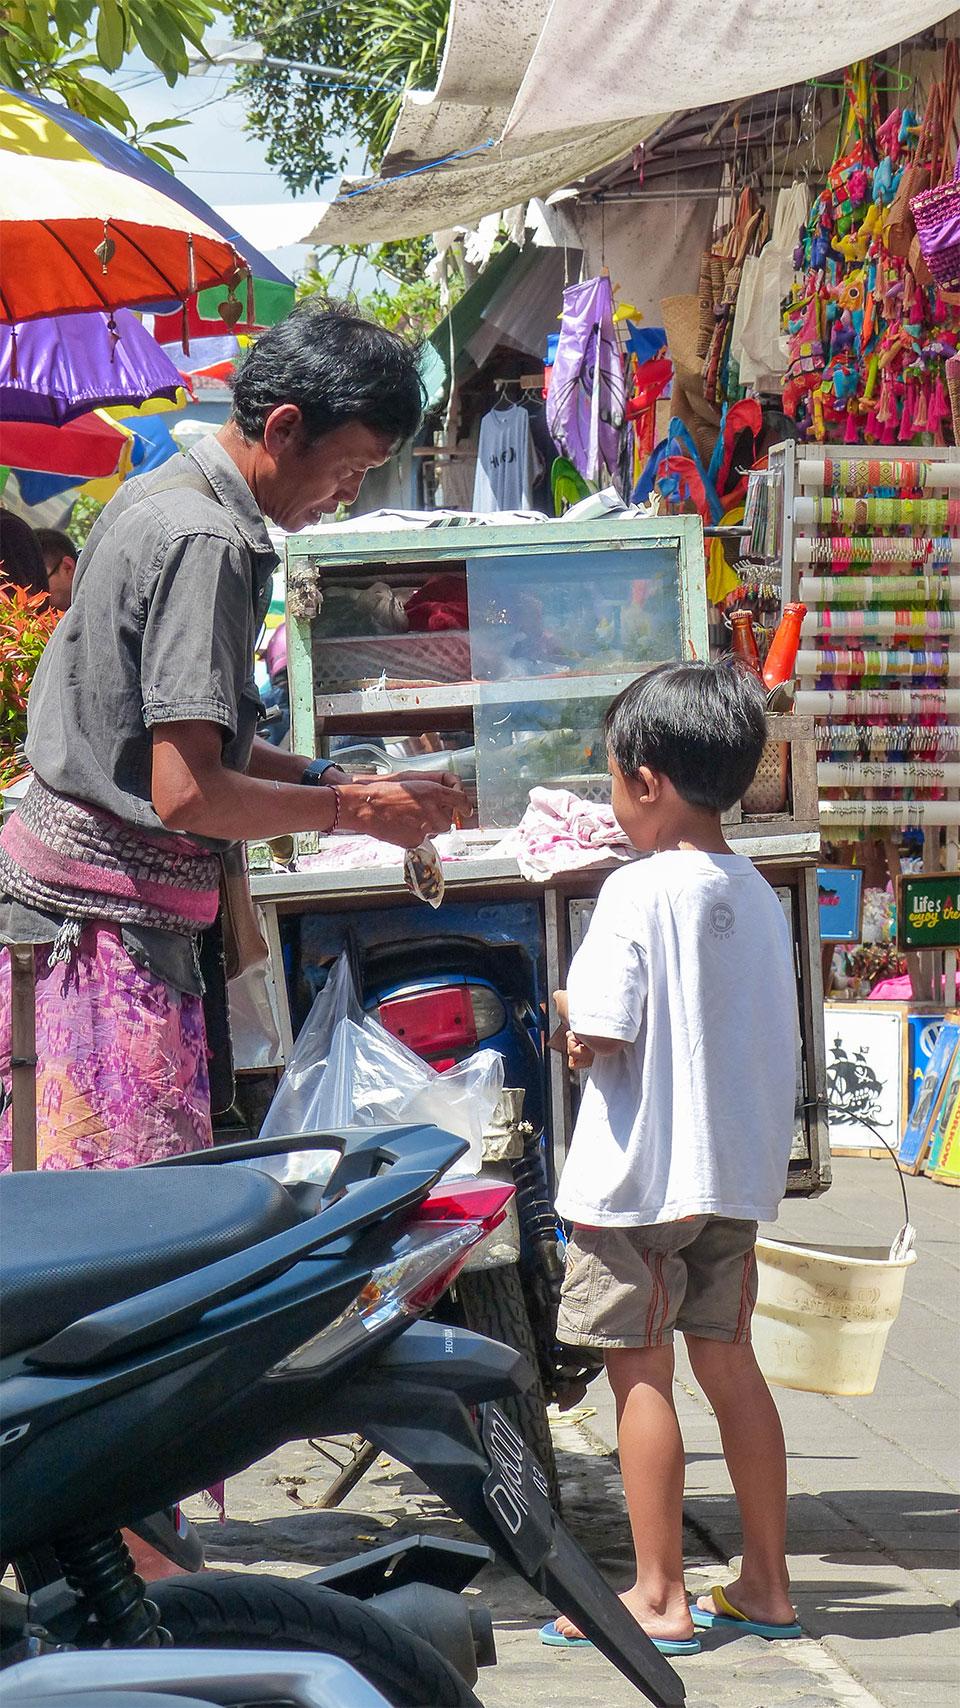 4-2-Bali-Kids-SupperTime